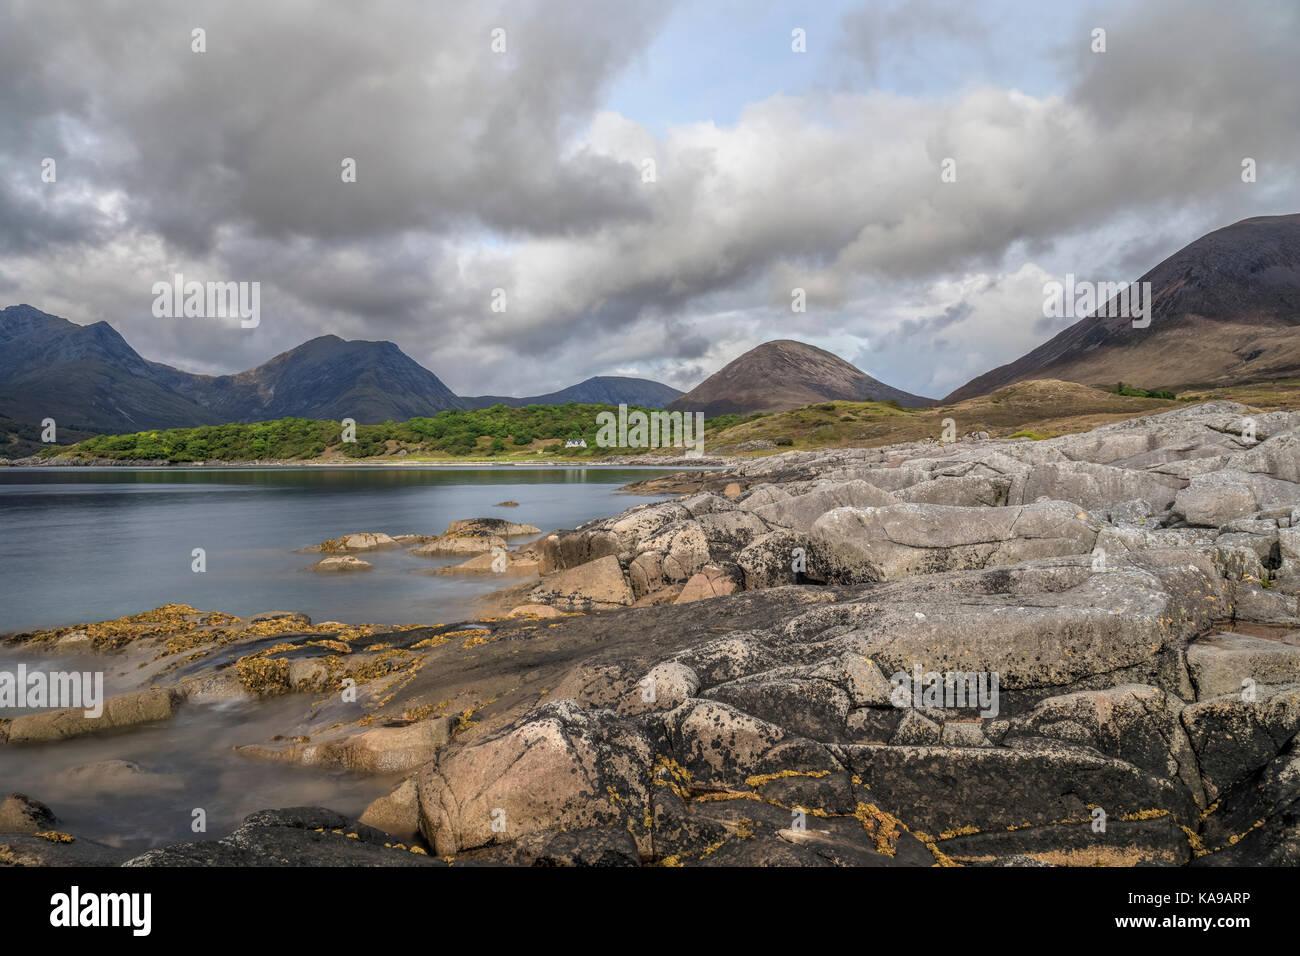 Loch Slapin, Black Cuillin, Isle of Skye, Scotland, United Kingdom - Stock Image